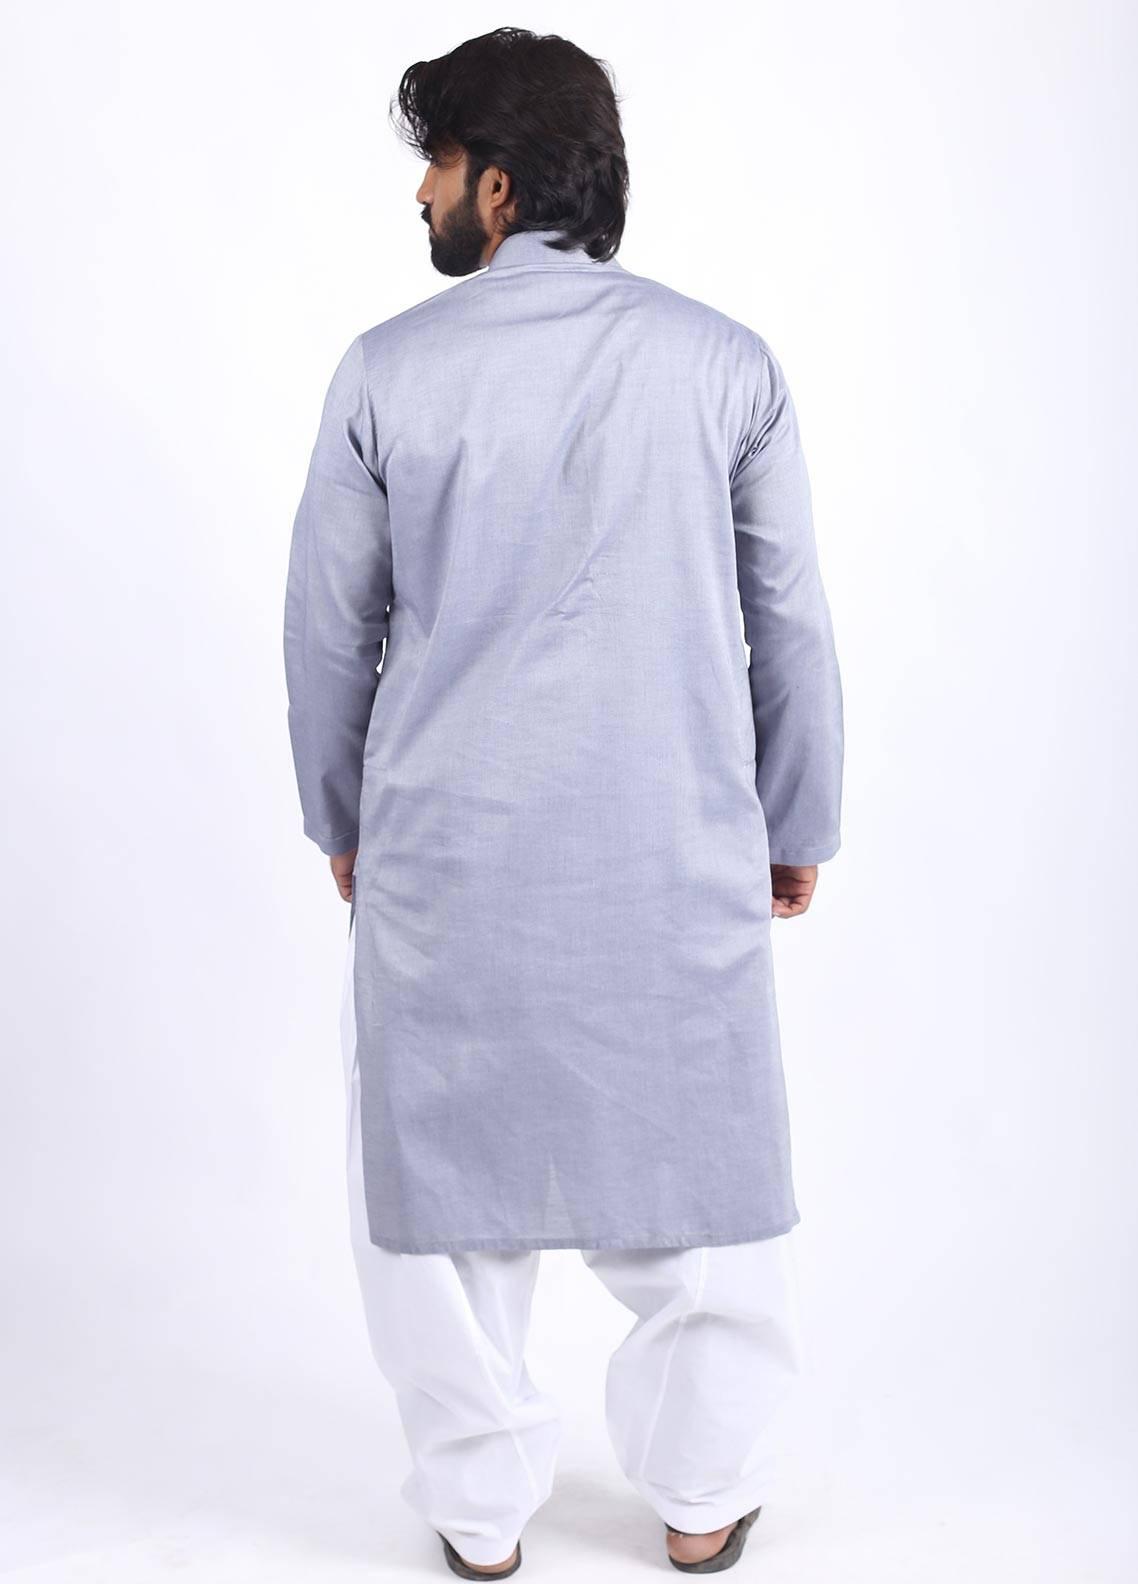 Sanaulla Exclusive Range Cotton Formal Kurtas for Men - Purple SAM18K 03